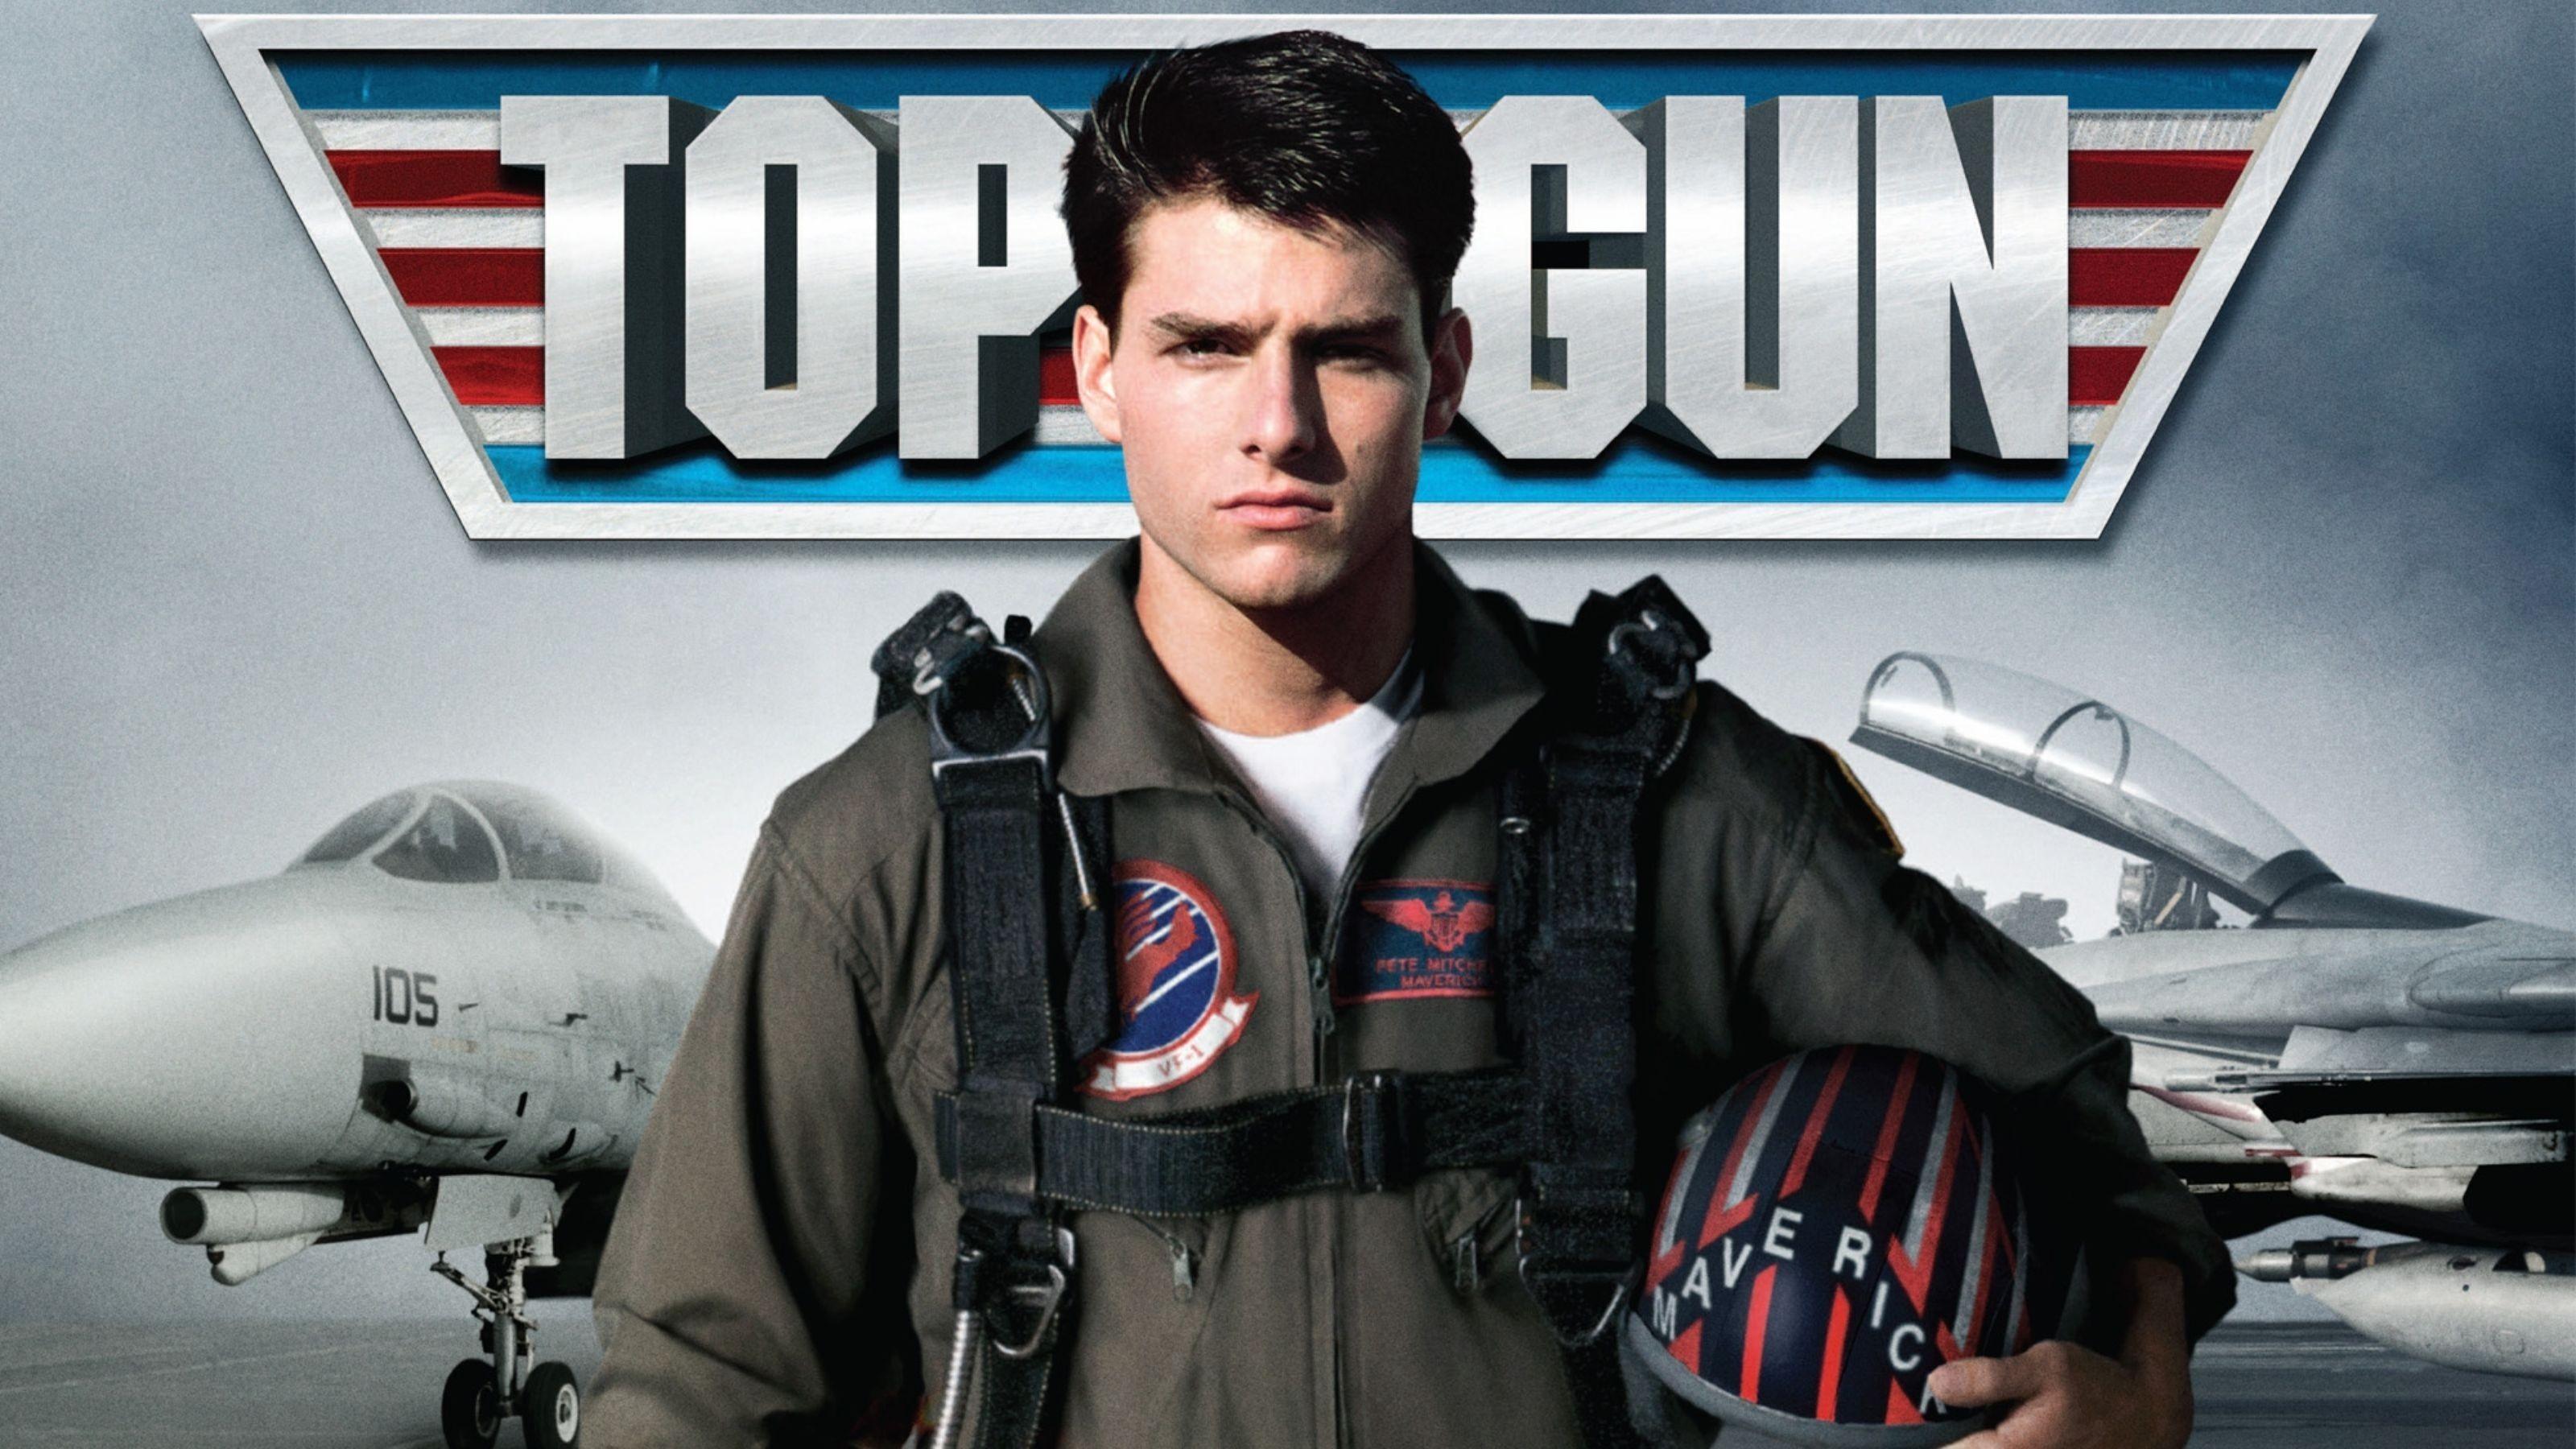 Top Gun Wallpaper HD 72 images 3200x1800